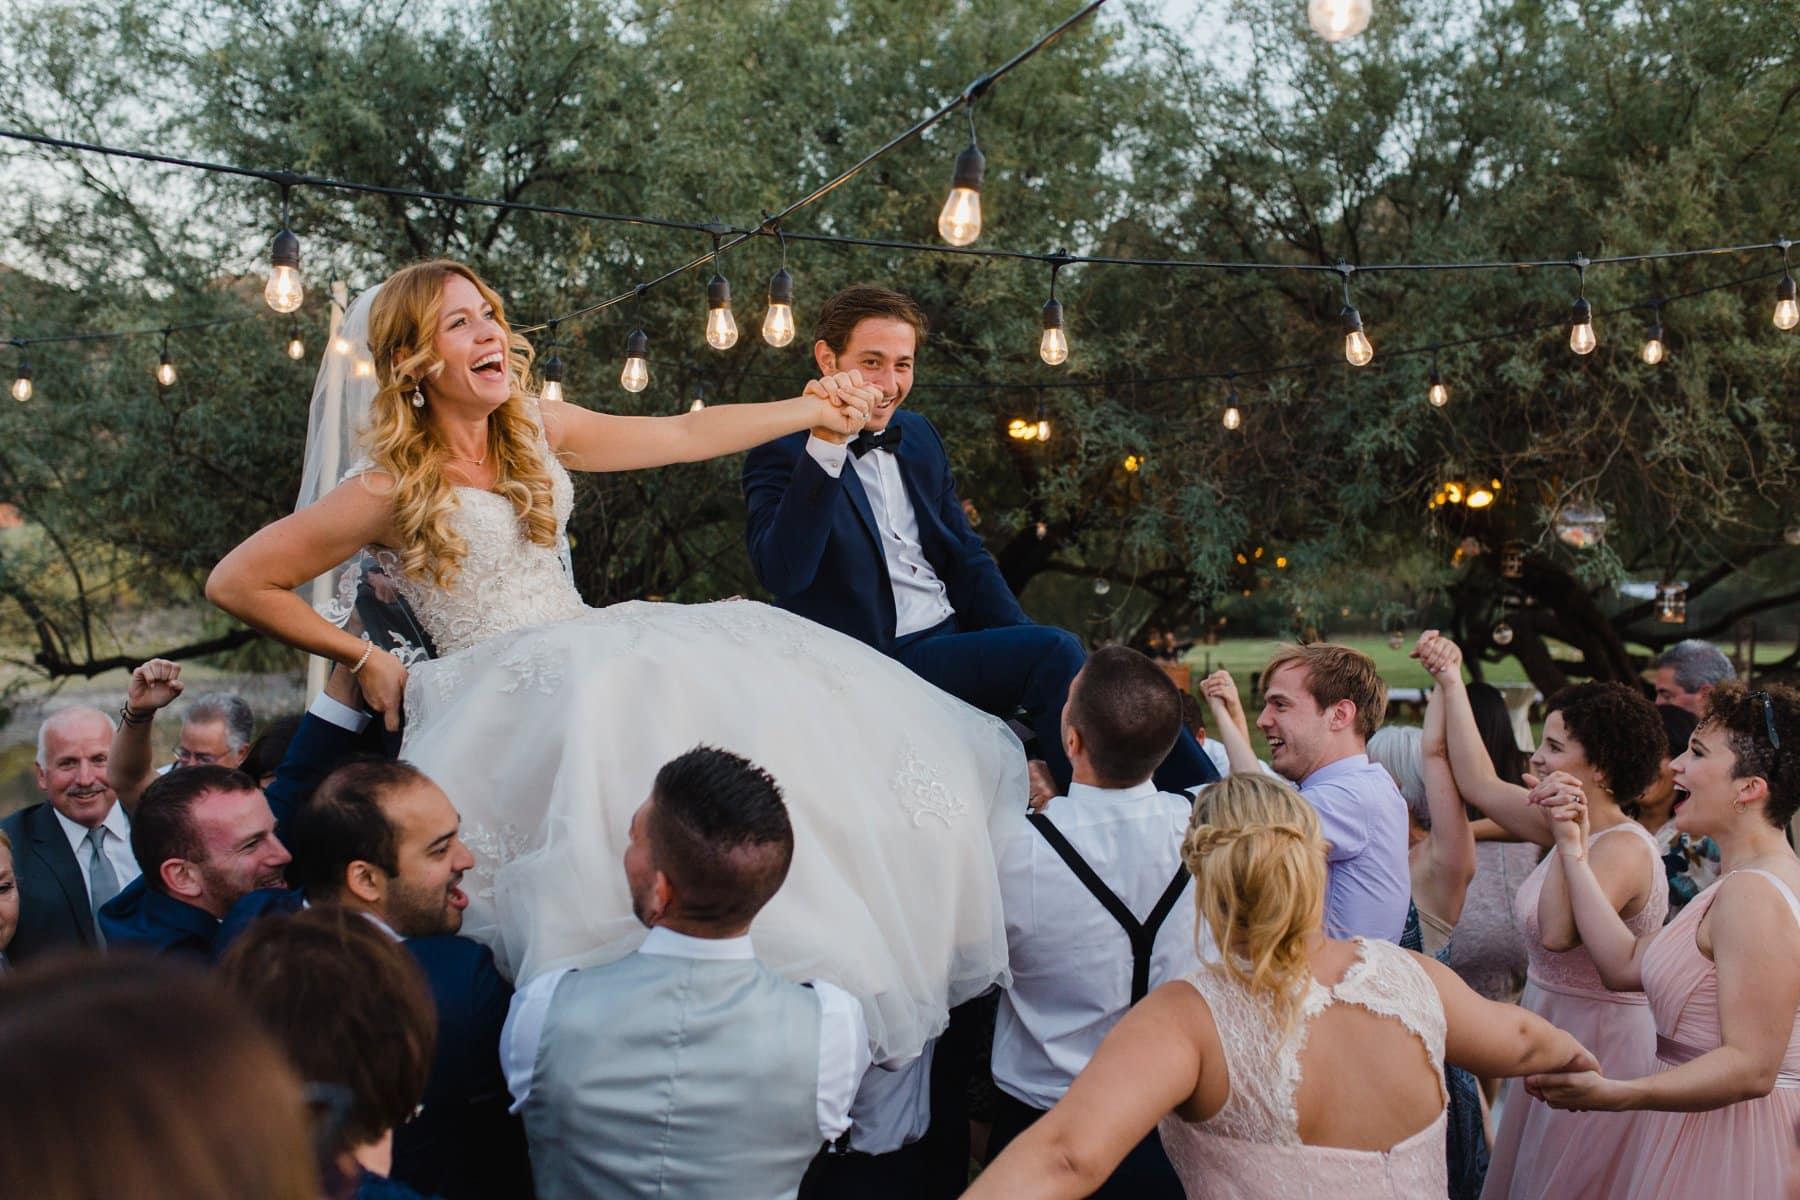 hora at Saguaro Lake Ranch wedding documentary candid wedding photographer Arizona